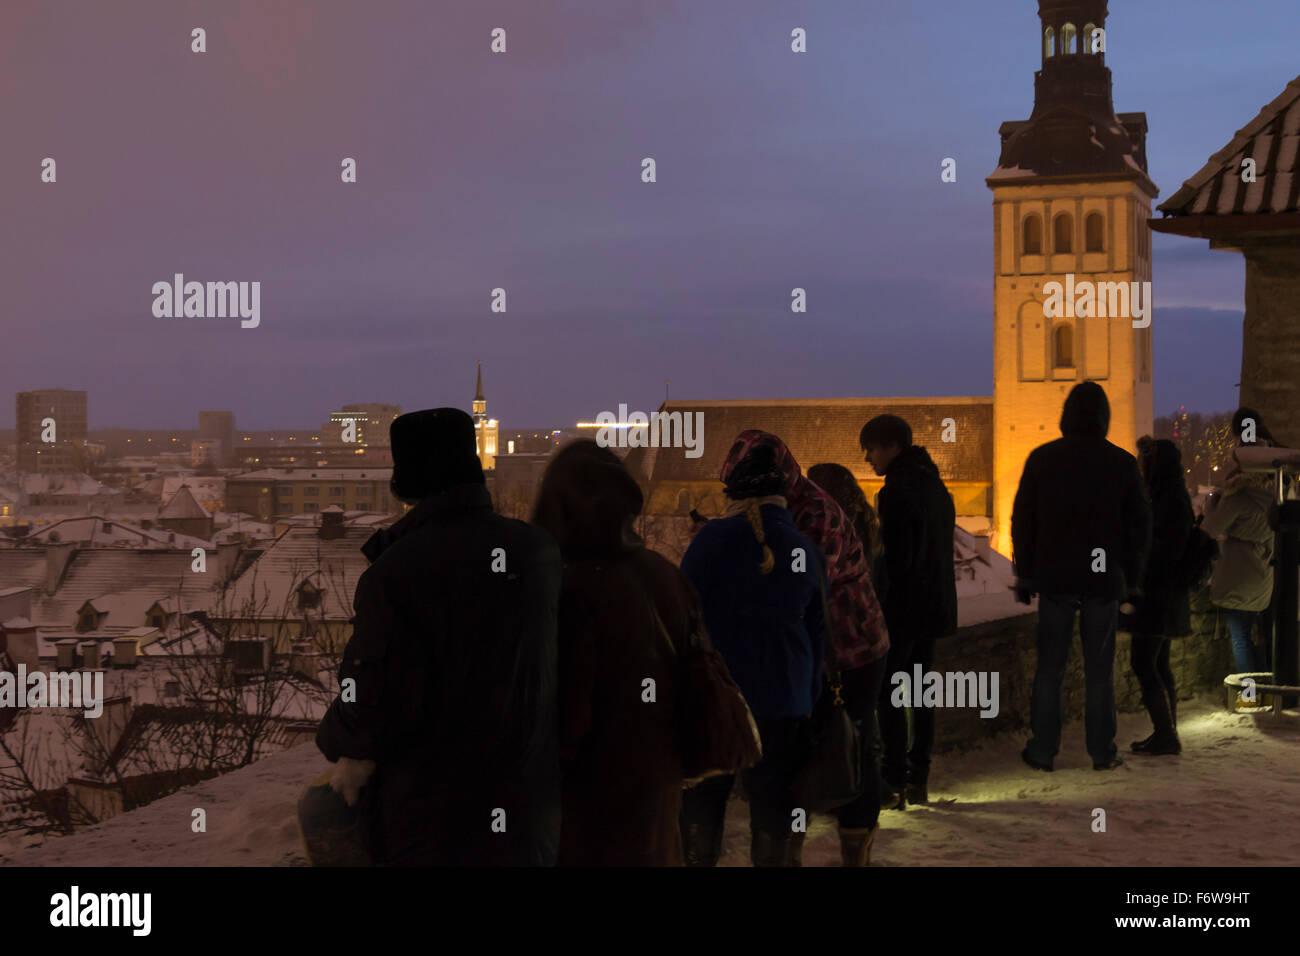 tourists-at-night-at-kohtuotsa-sightseeing-platform-viewing-the-old-F6W9HT.jpg